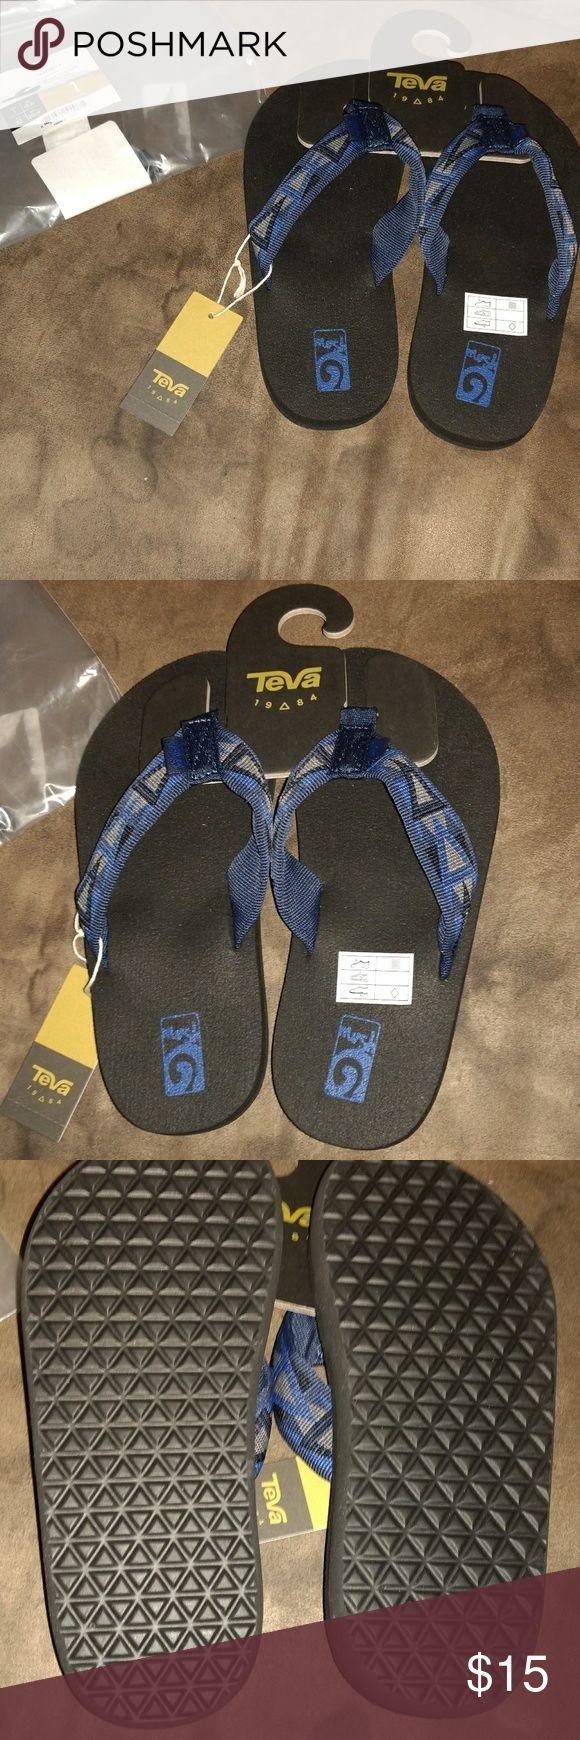 Teva Mush II boys flip flops Size 1 boys flip flops Teva Shoes Sandals & Flip Flops